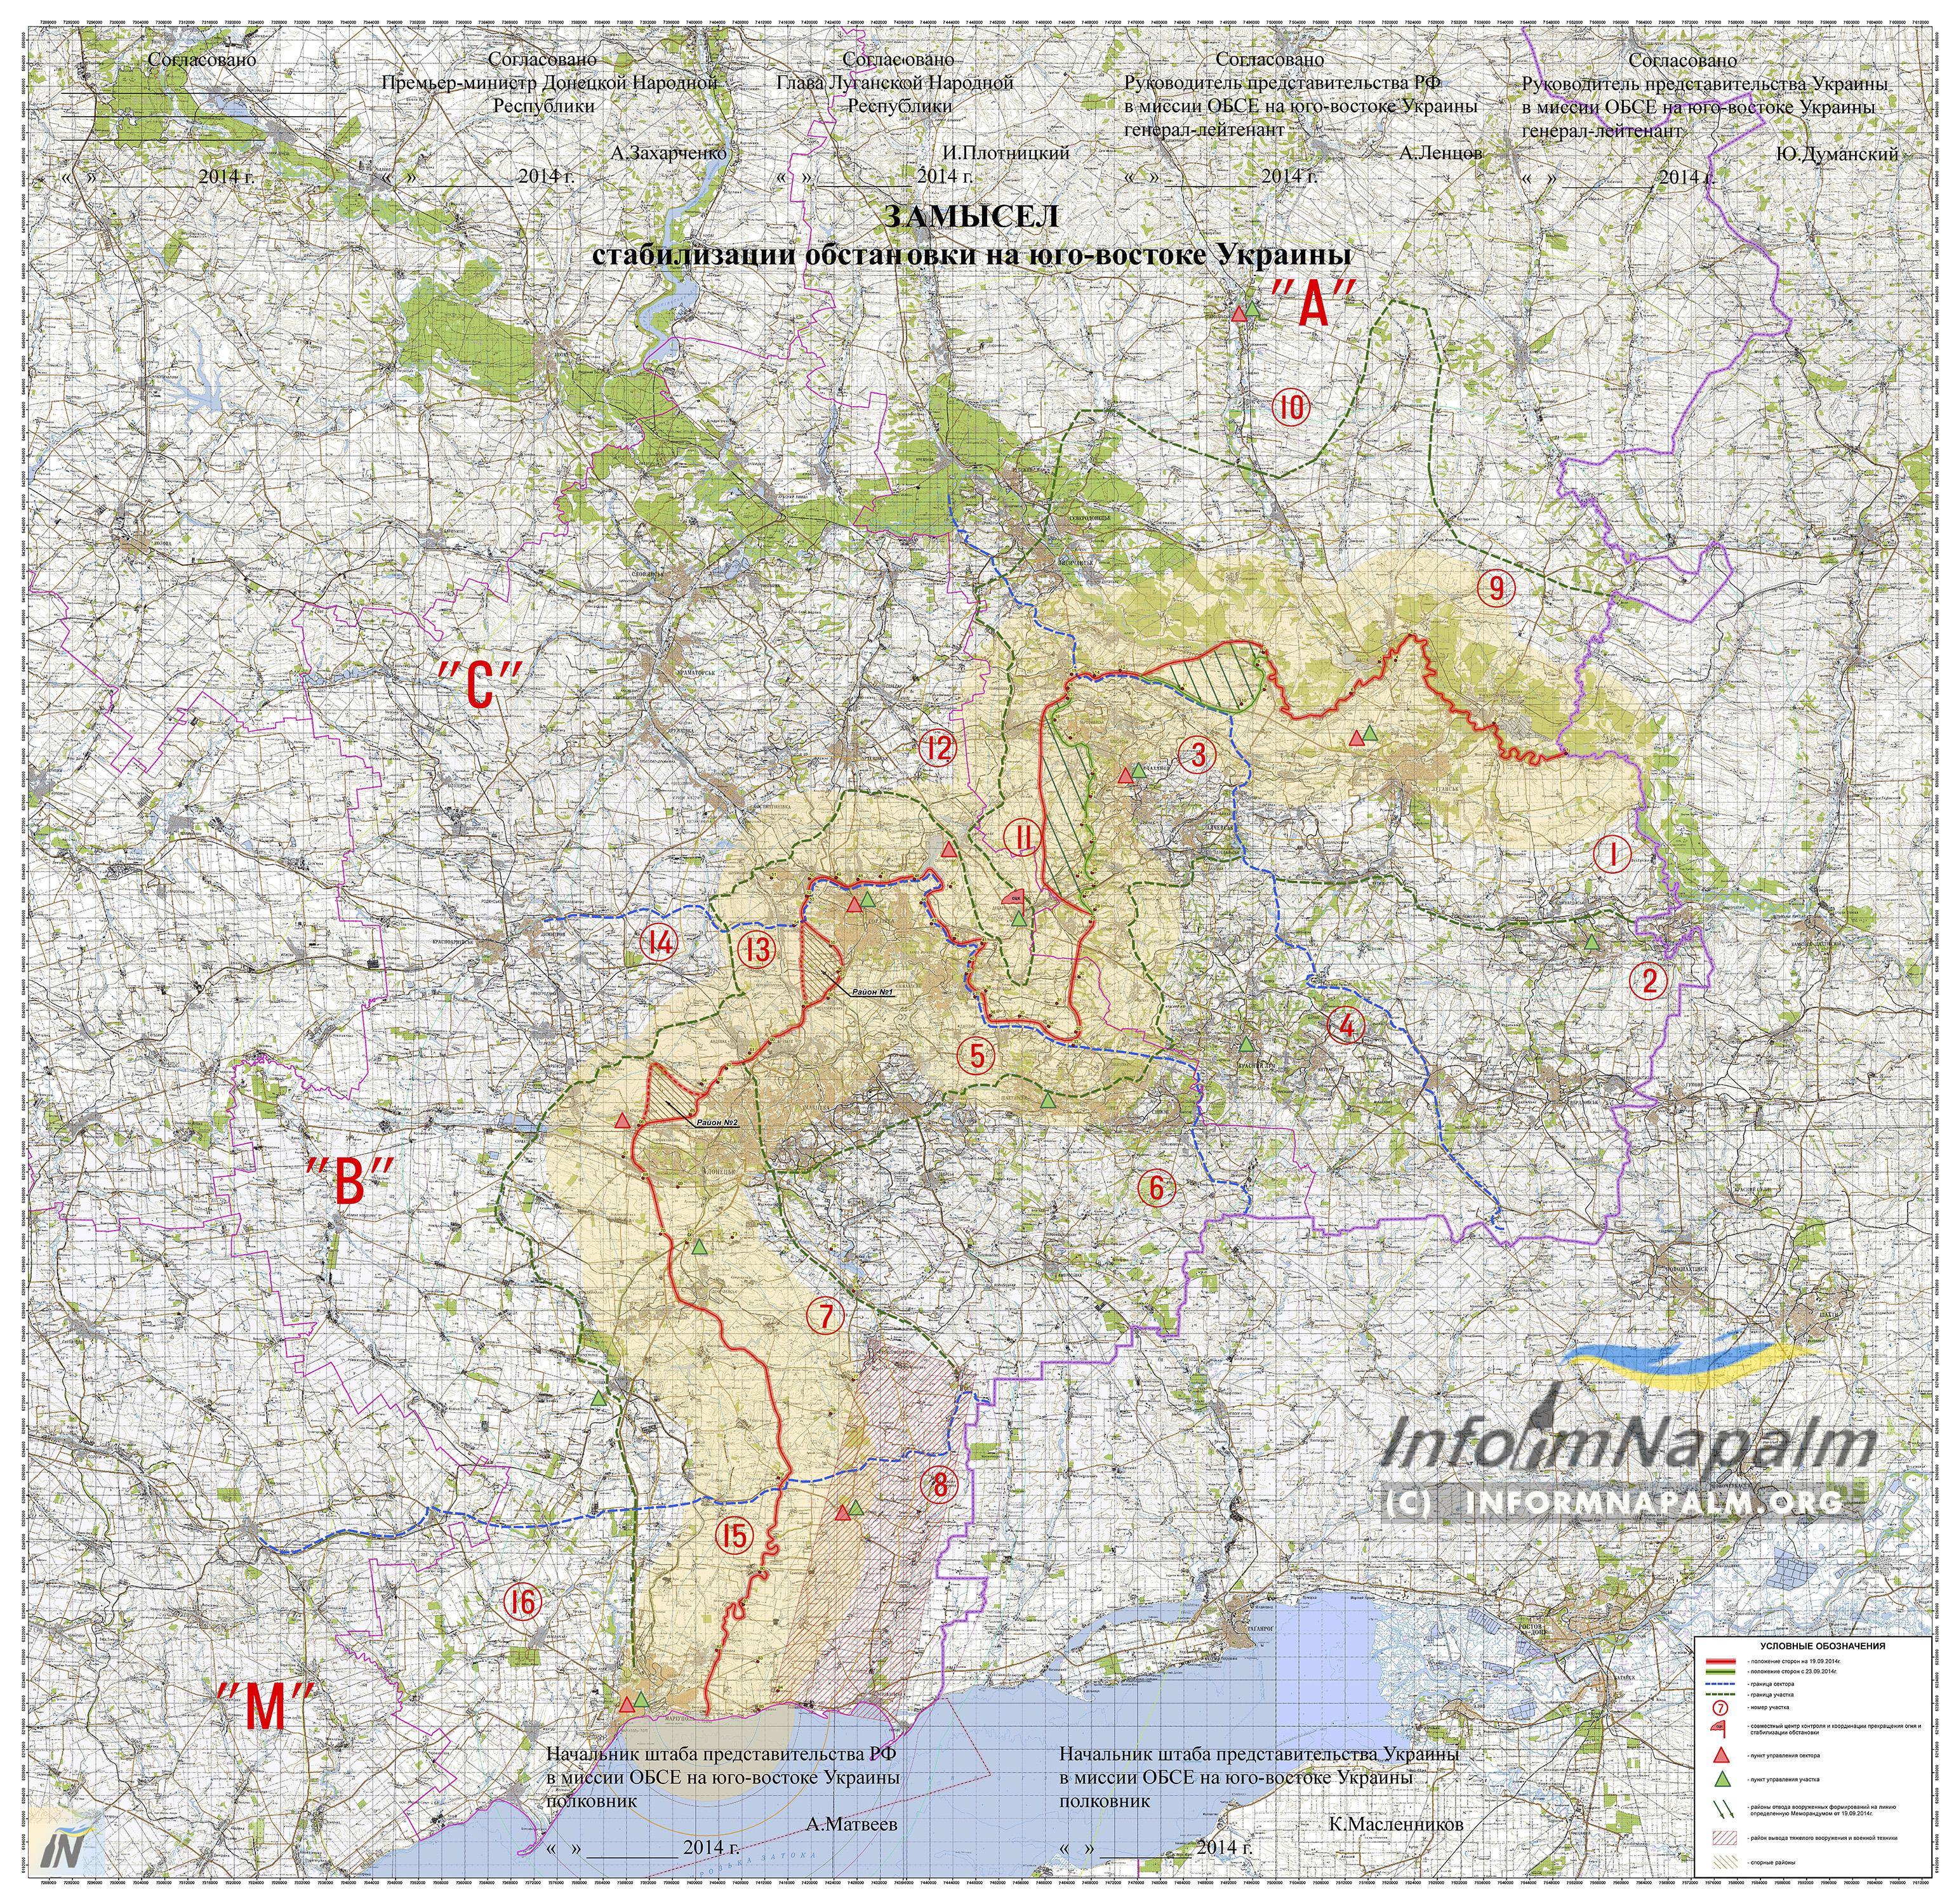 Европа далека от отмены санкций против РФ, - Могерини - Цензор.НЕТ 4838